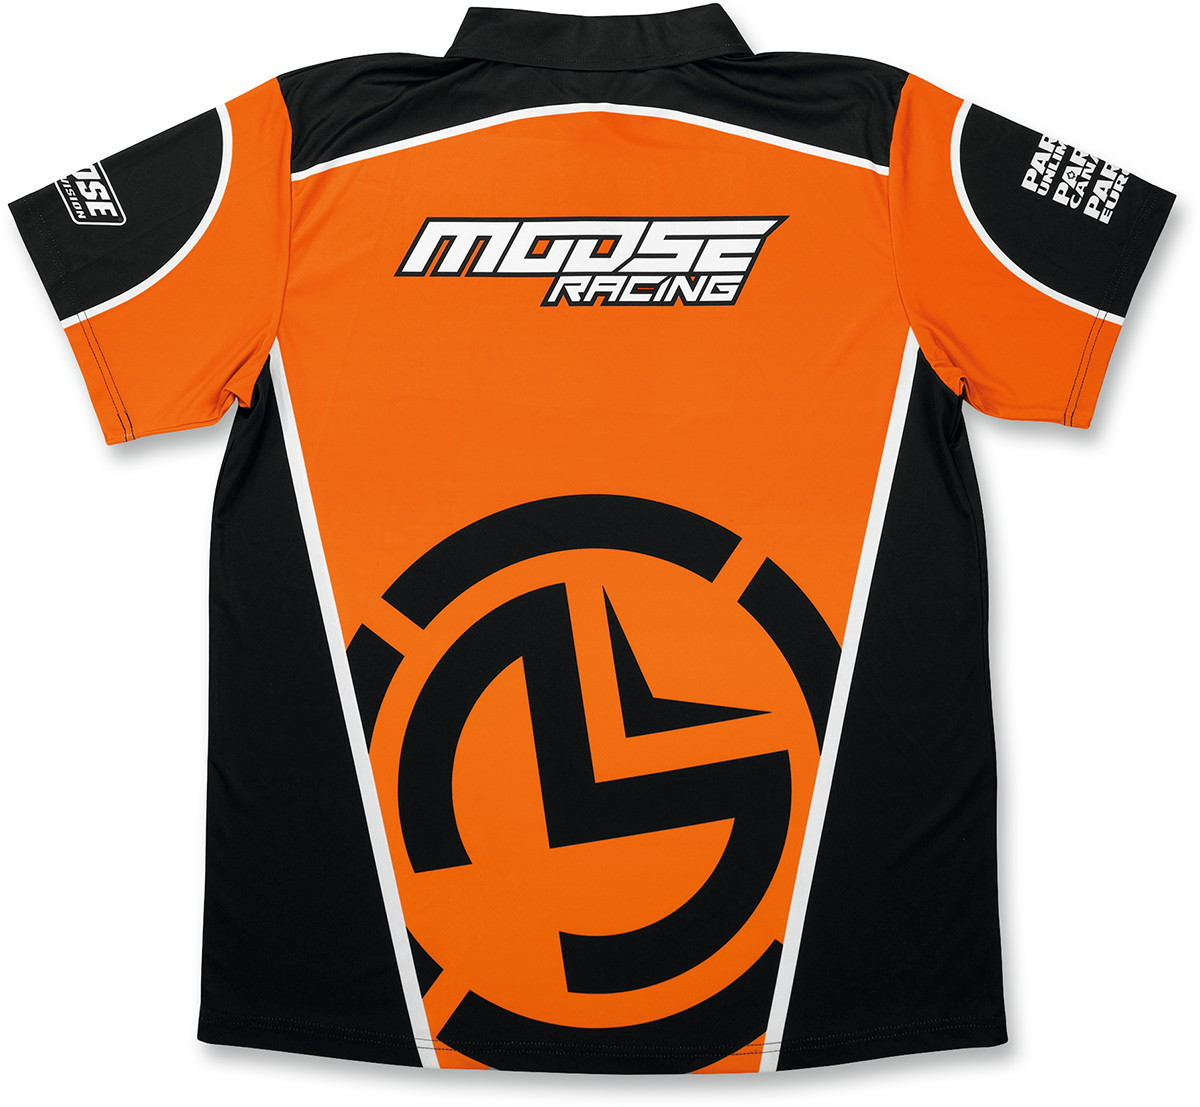 【MOOSE RACING】Pit襯衫 [3040-2332] - 「Webike-摩托百貨」